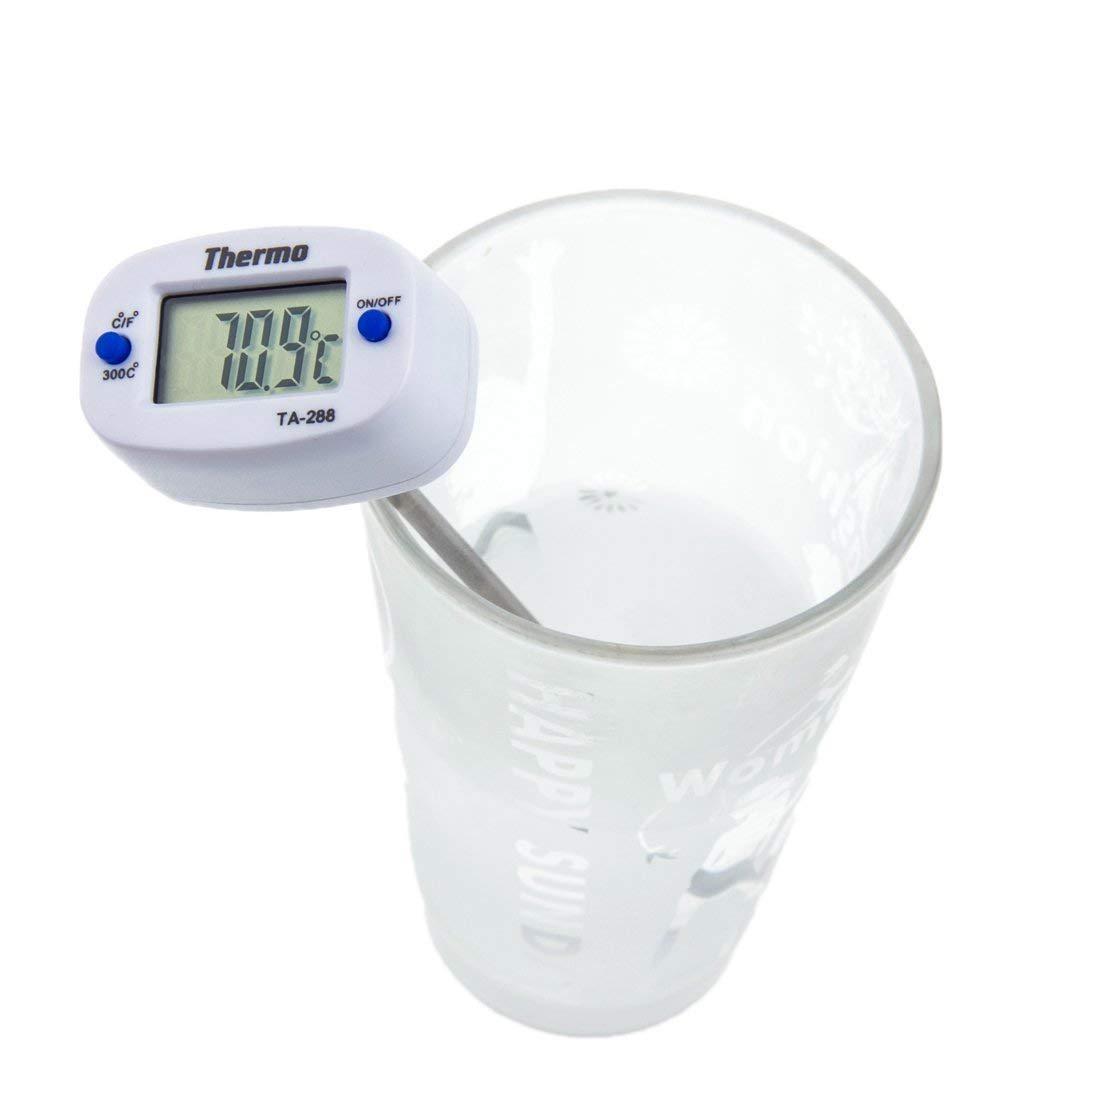 Кухонный термометр со щупом Thermo TA-288 Белый (ST-536002636)